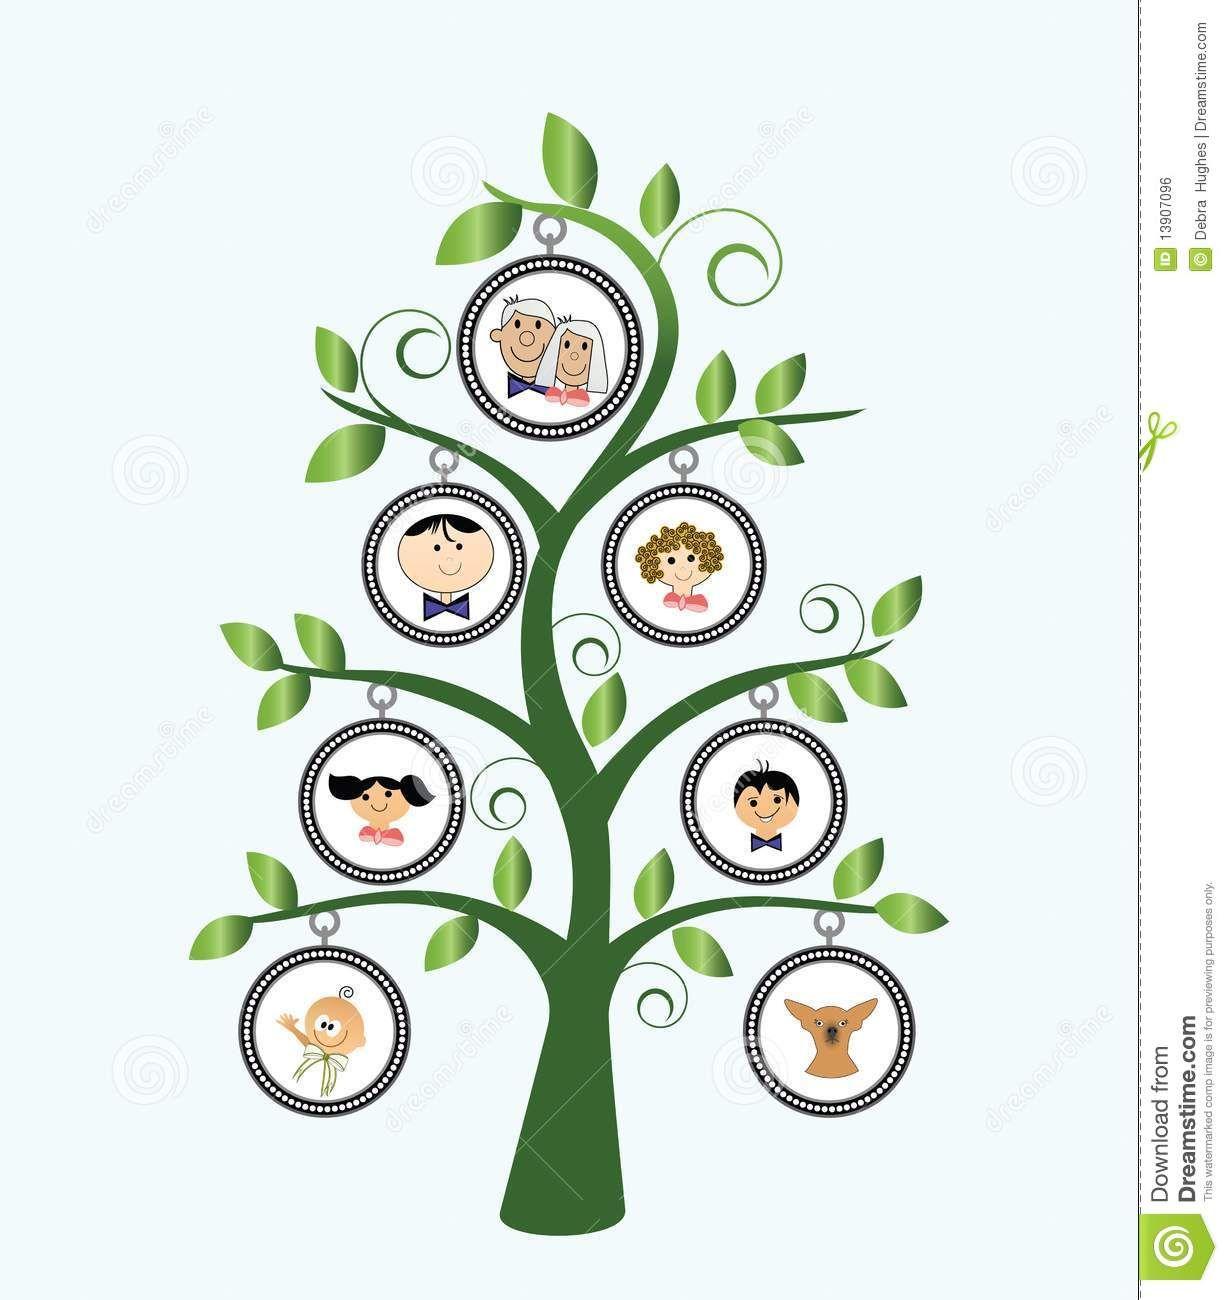 Class family tree : Myofascial release back pain